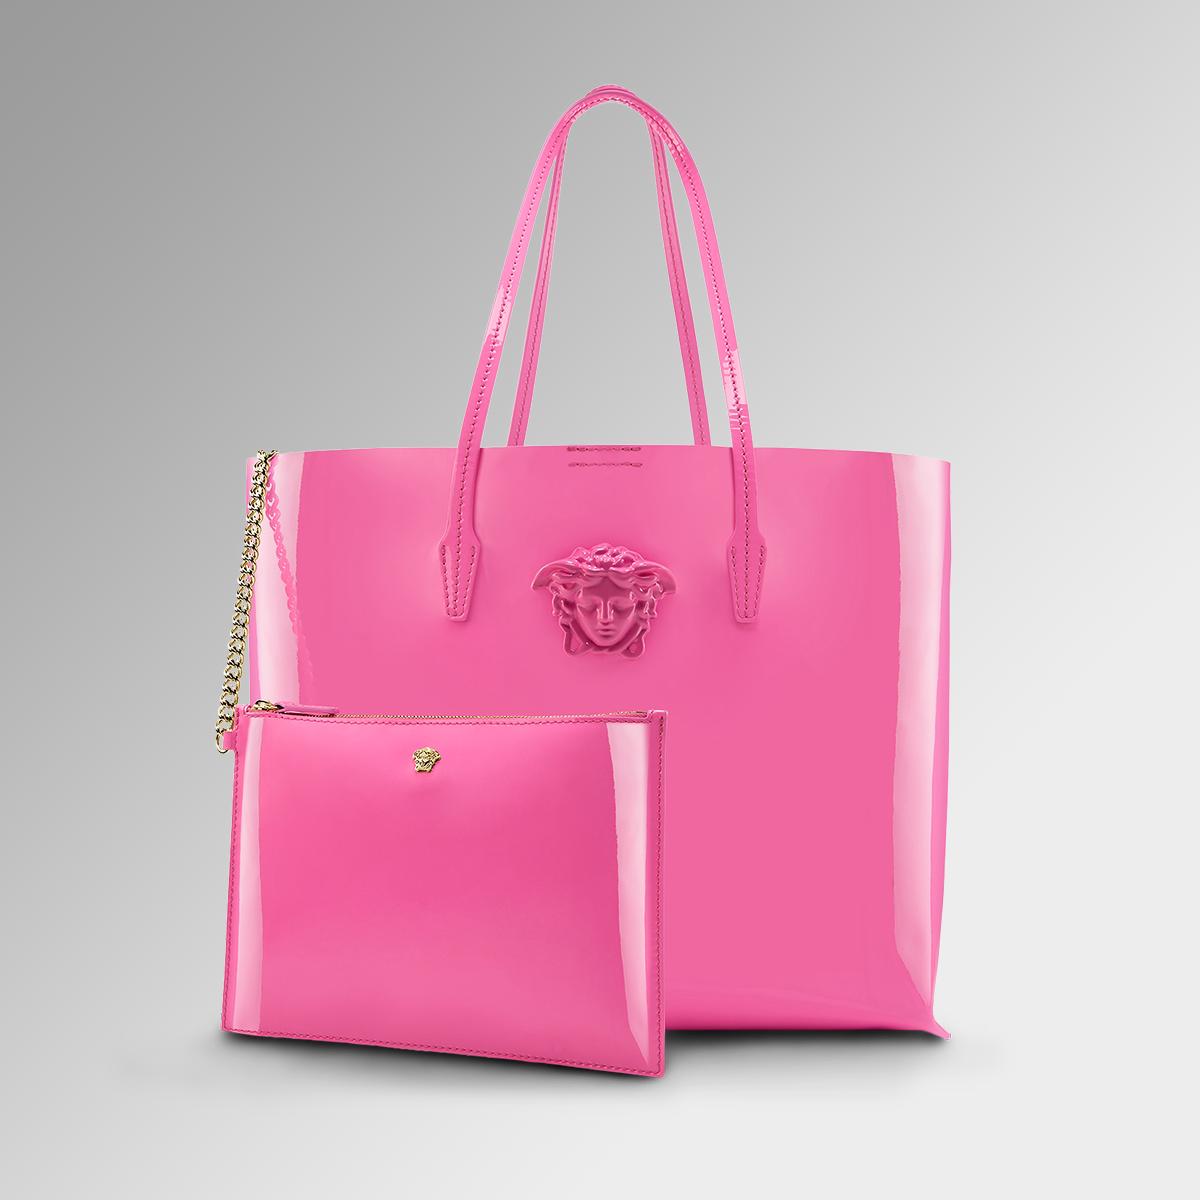 31c5b832cb5e Get more  Versace Women s Pre-Spring 2016 bags on versace.com   VersacePalazzo